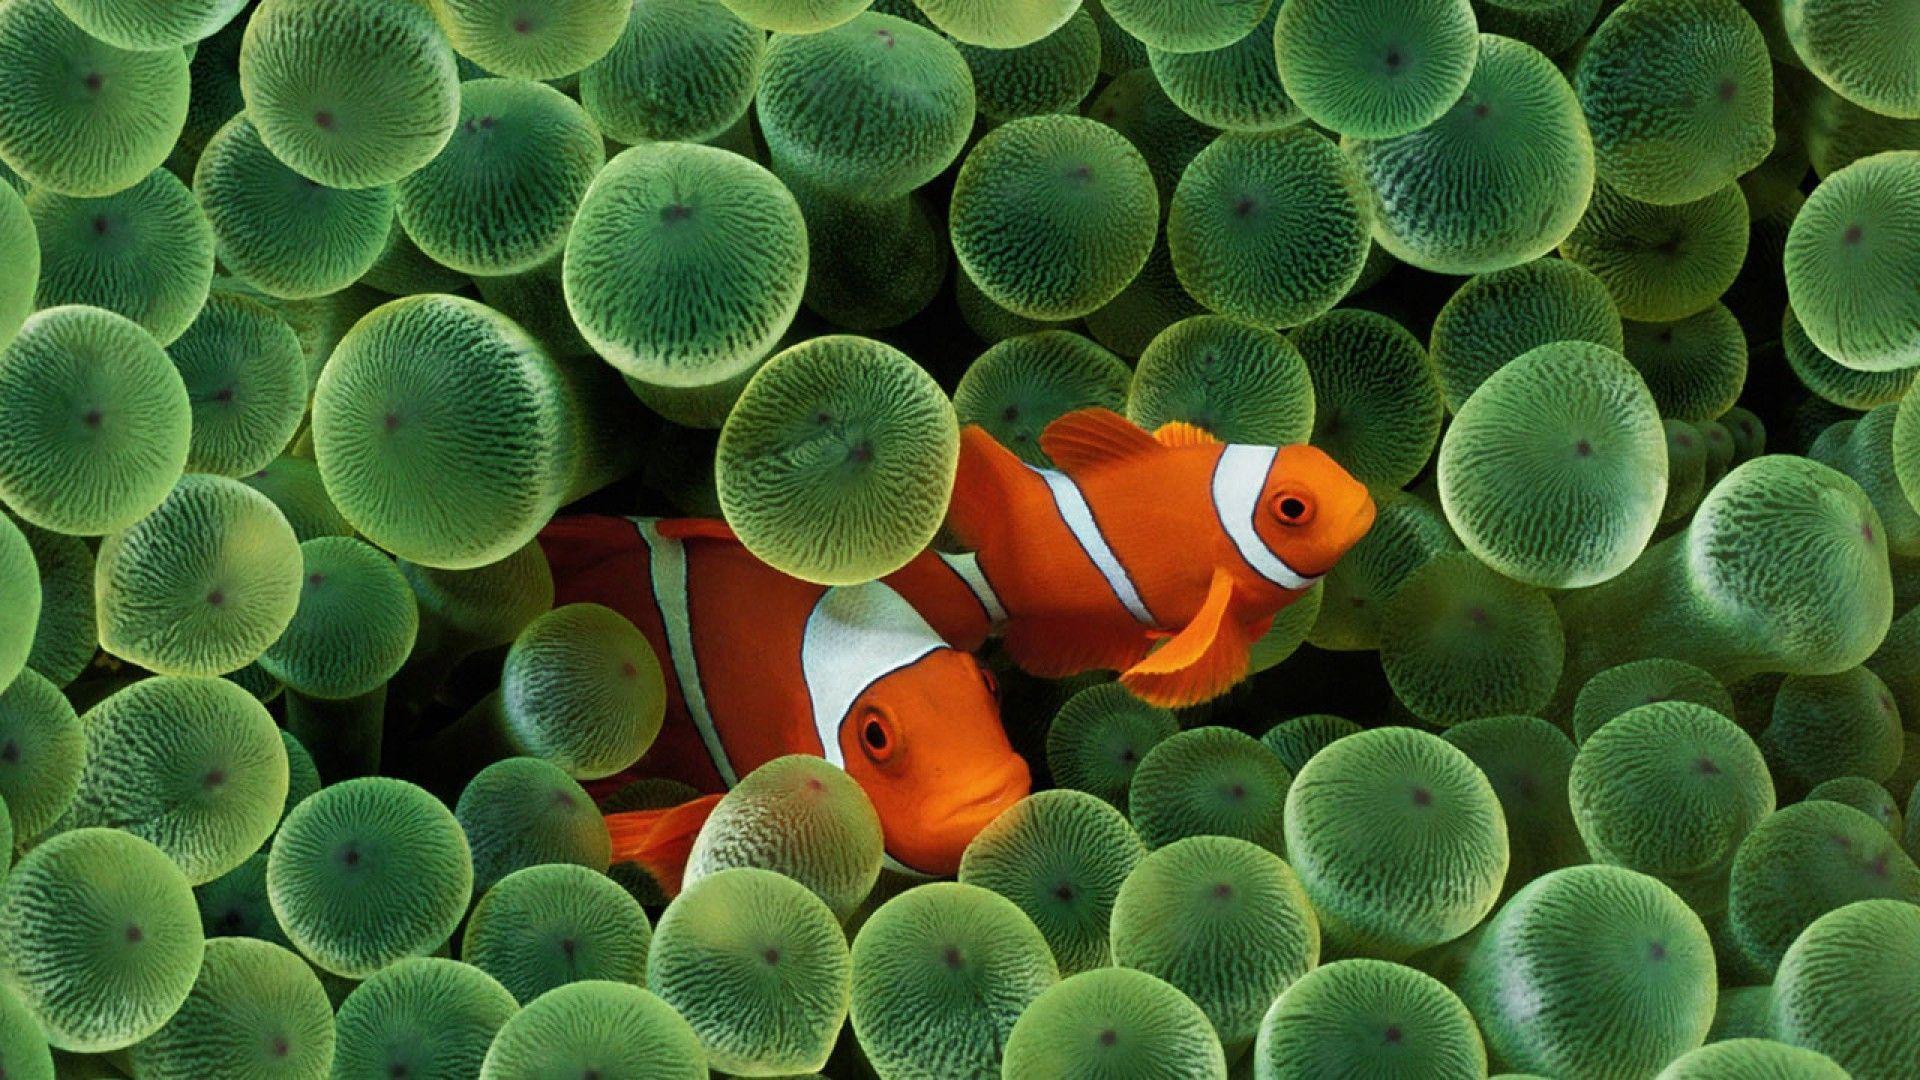 green fish wallpaper for phone - photo #8